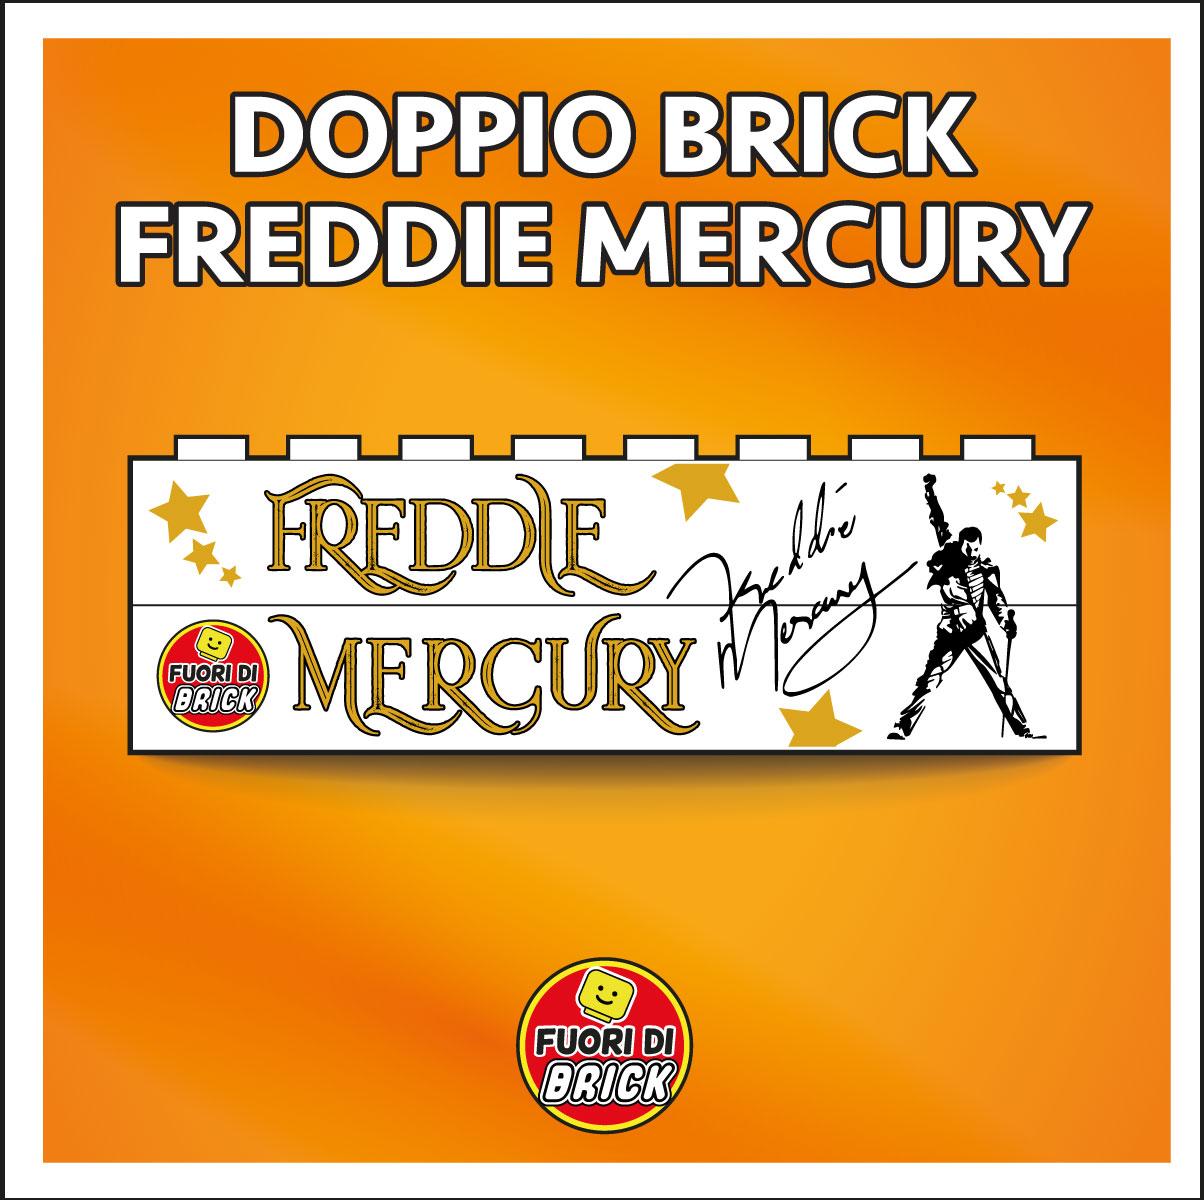 DOPPIO BRICK 1X8_FREDDIE MERCURY